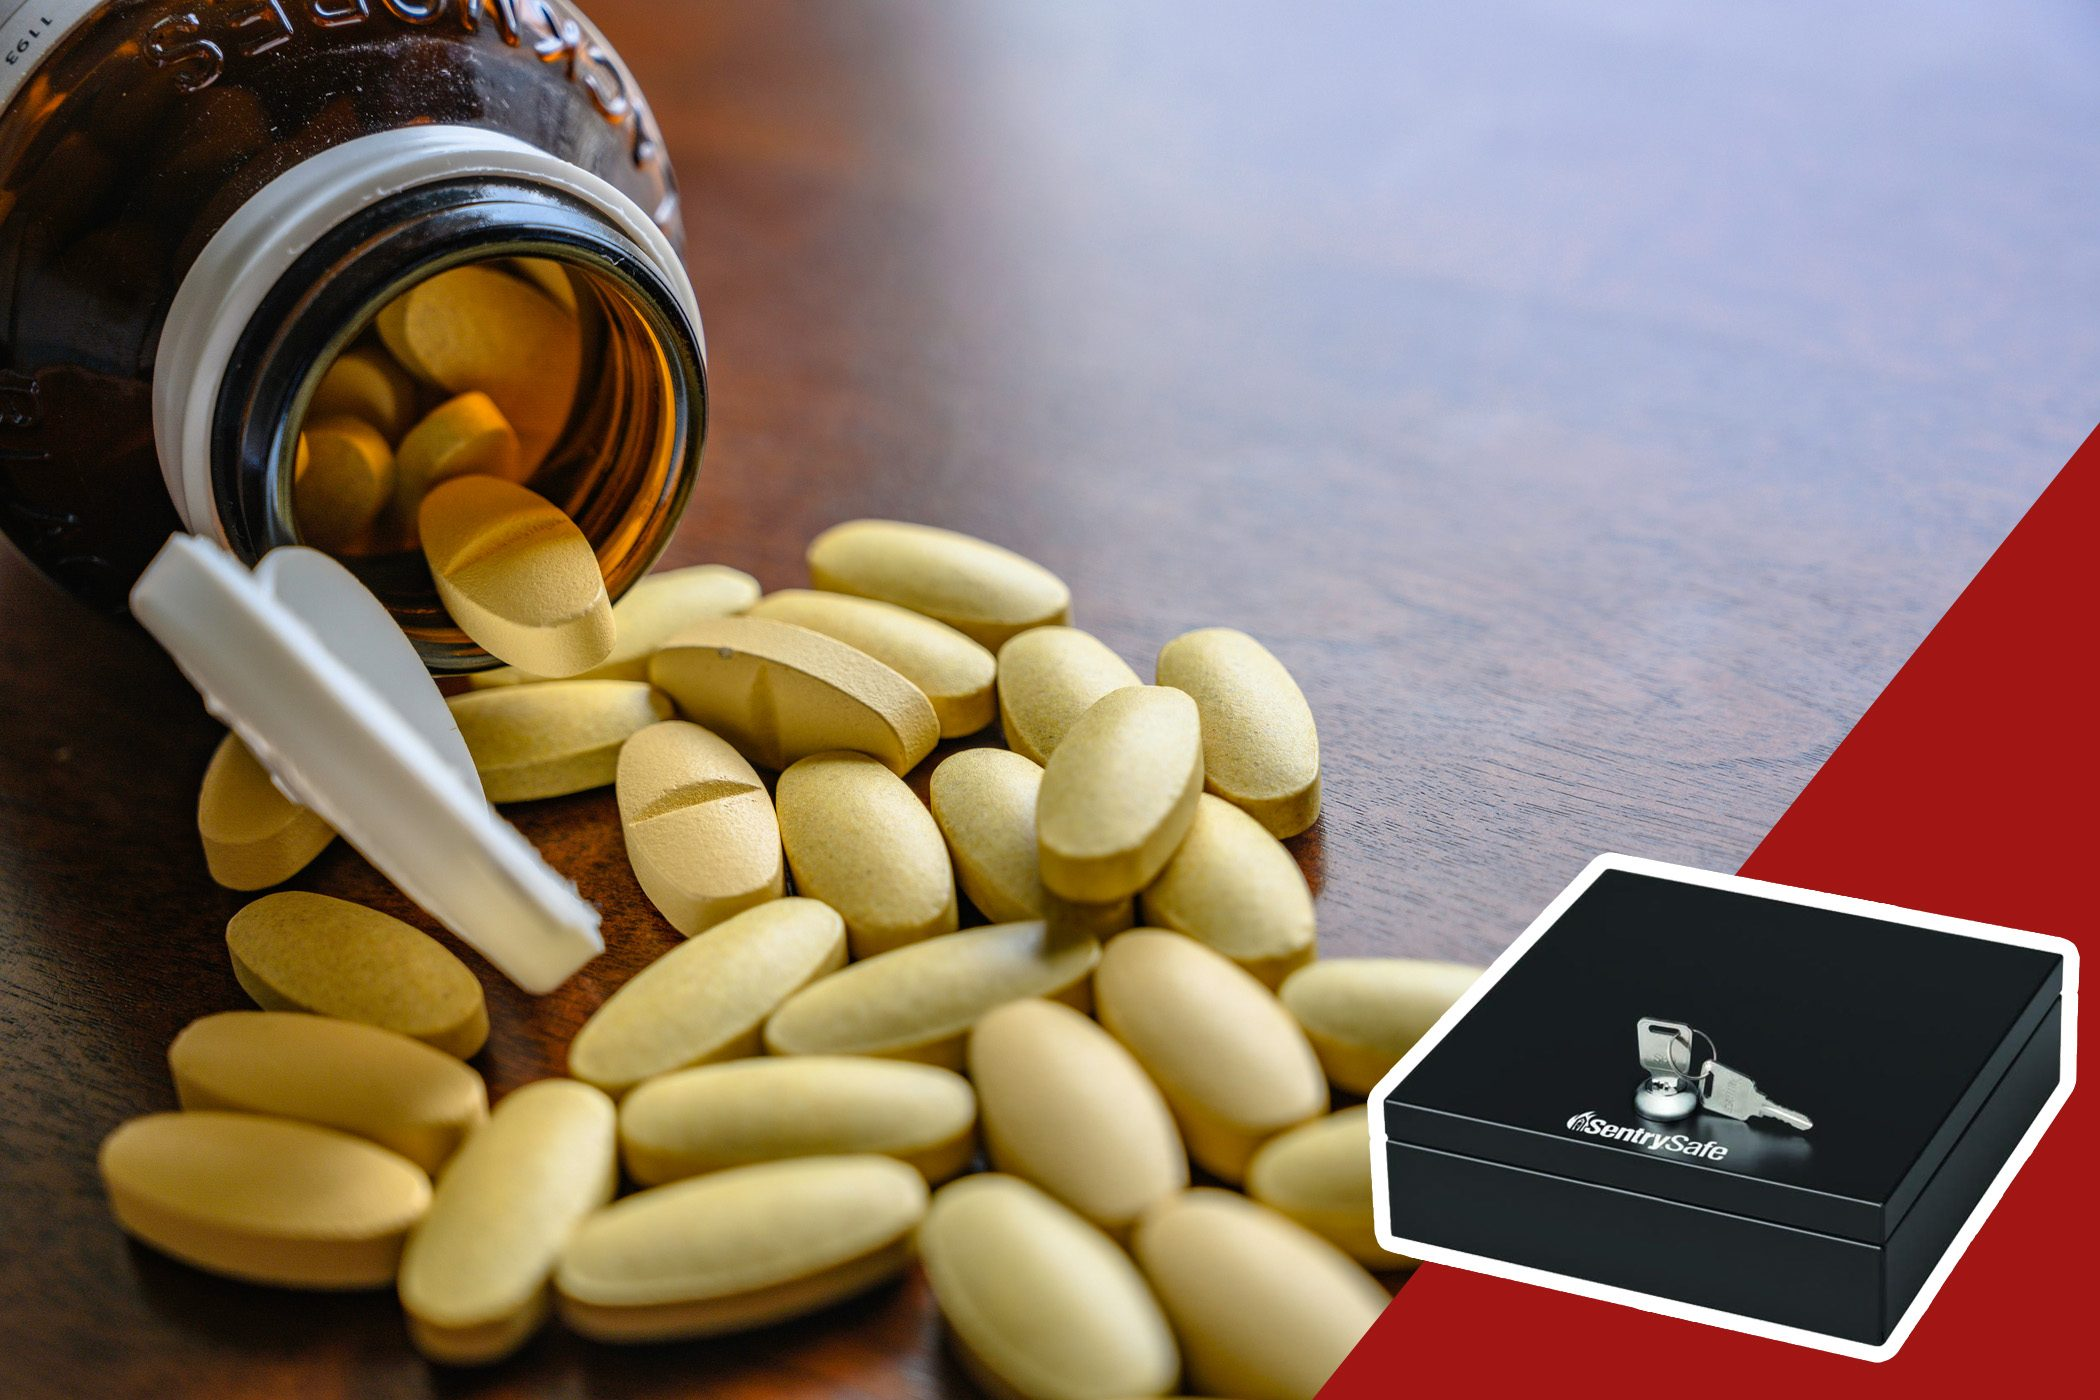 medications keep safe